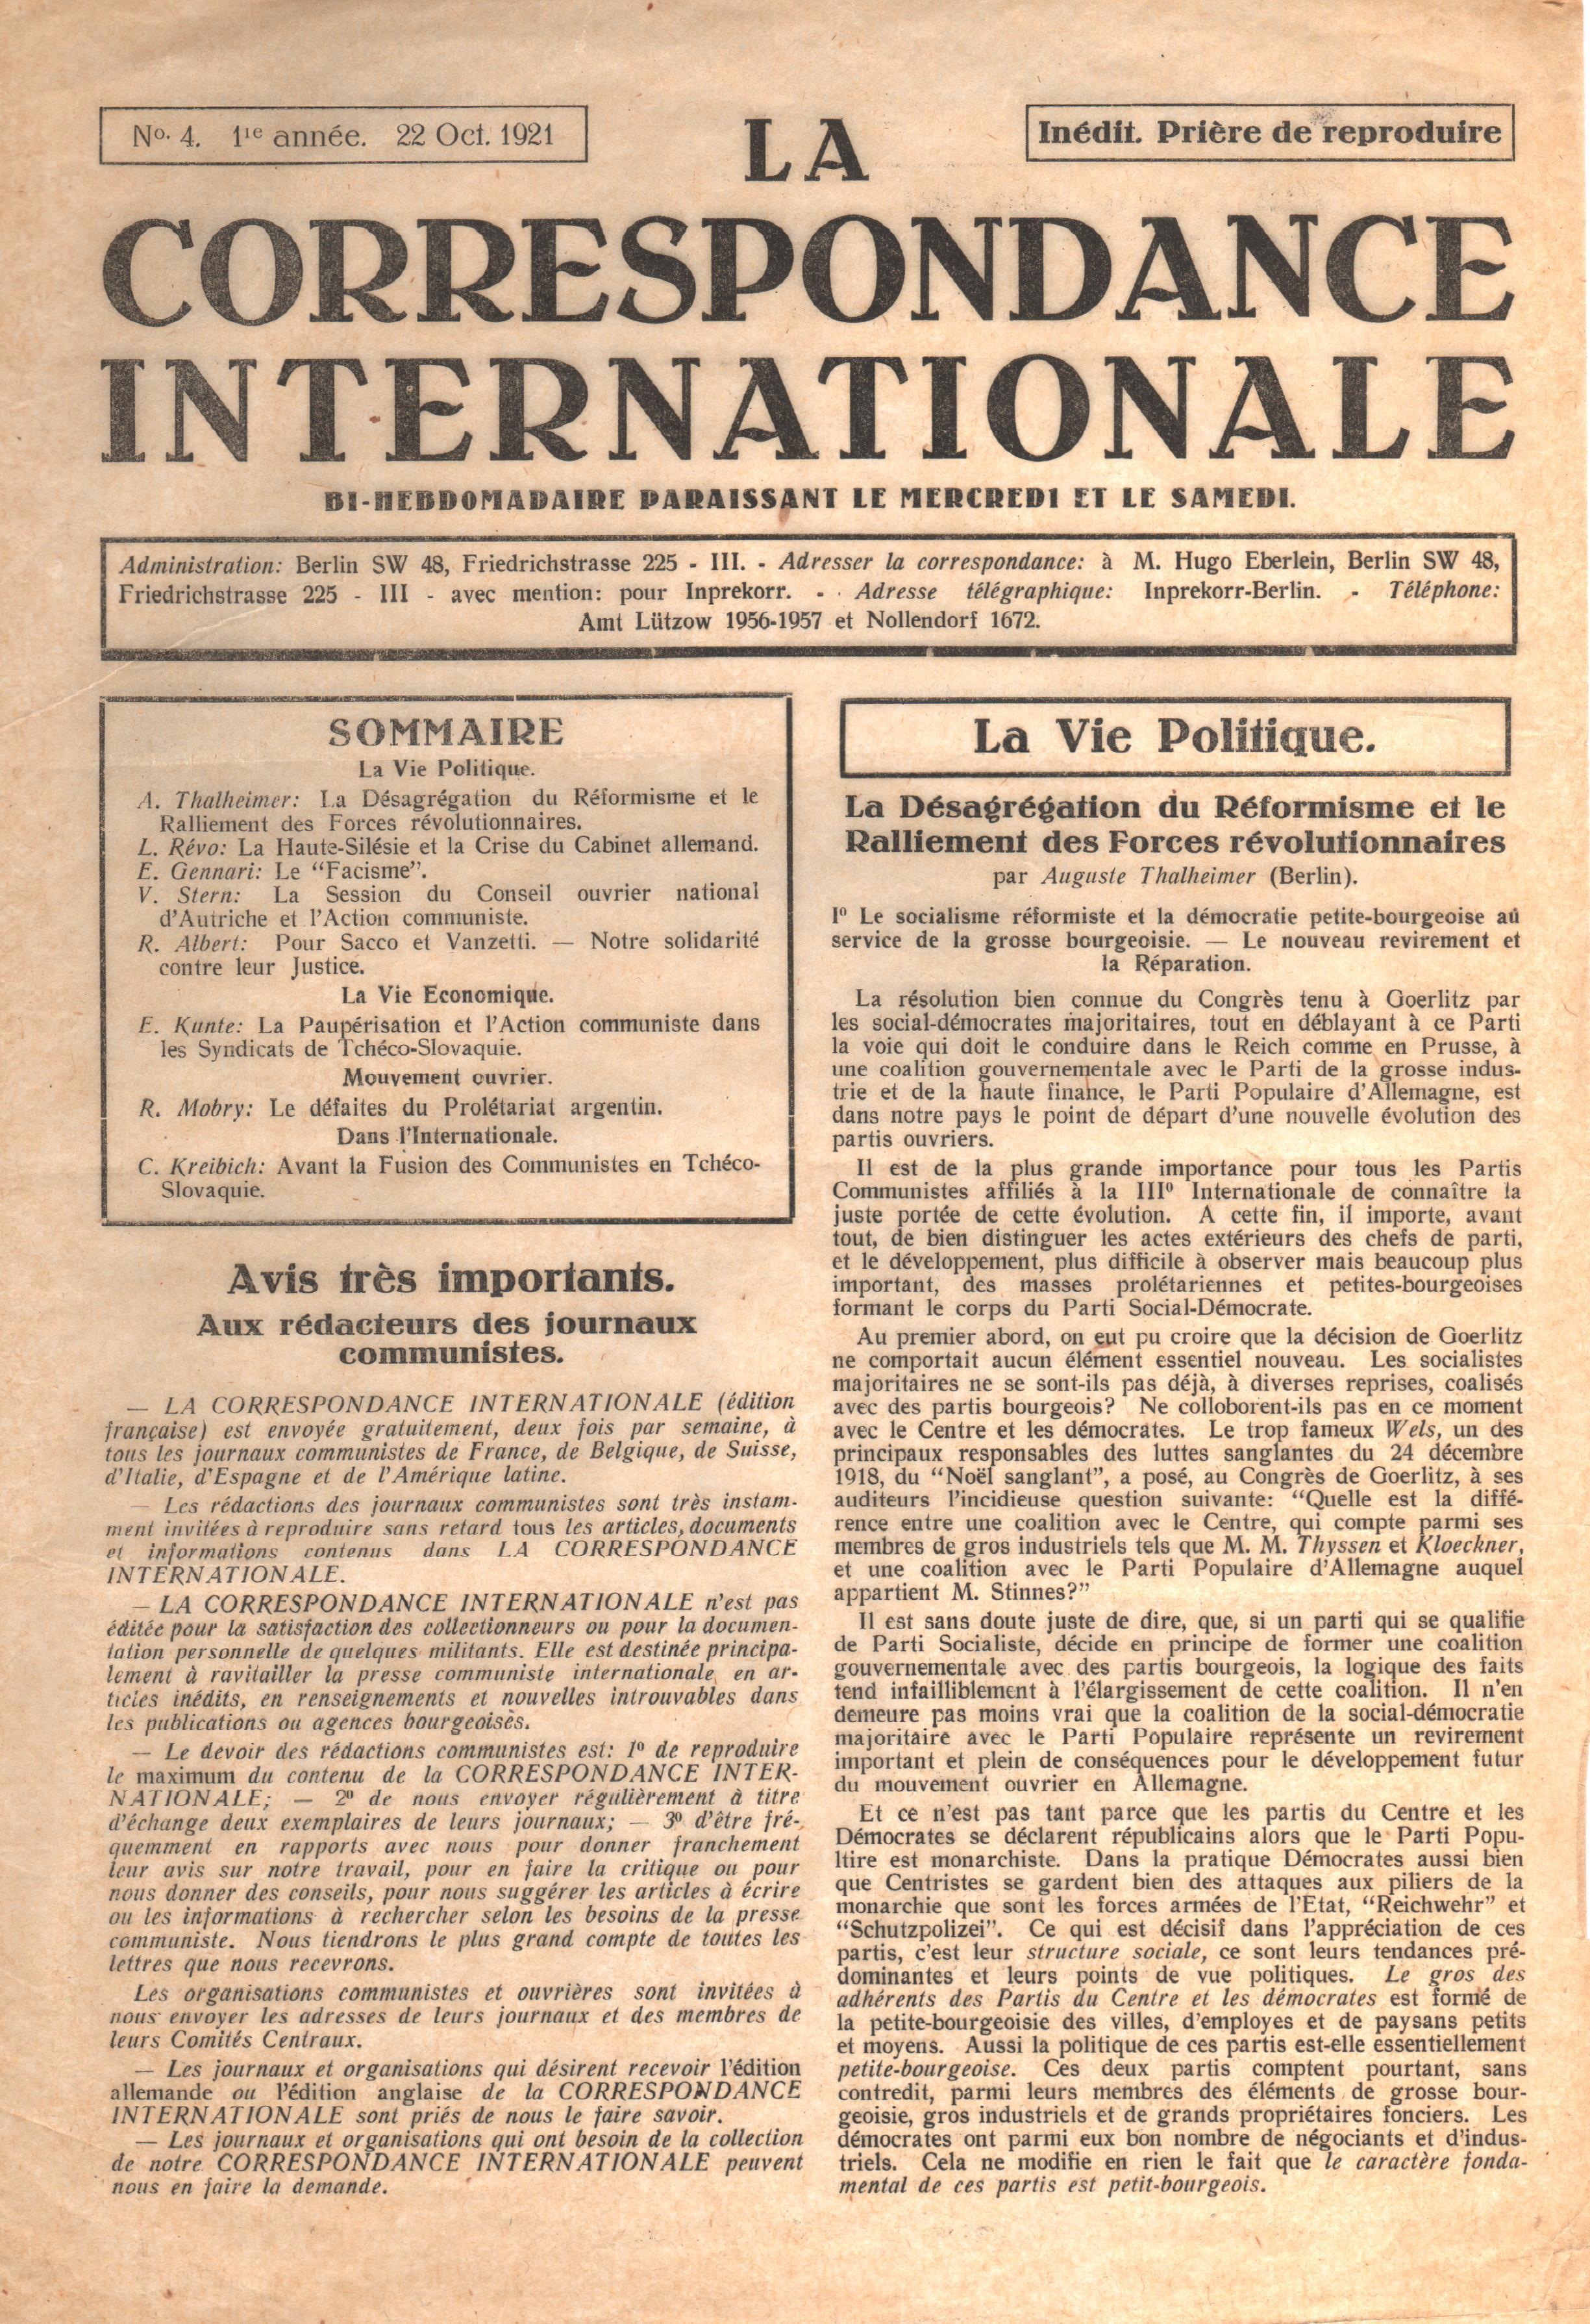 Correspondance Internationale n. 4 - pag. 1